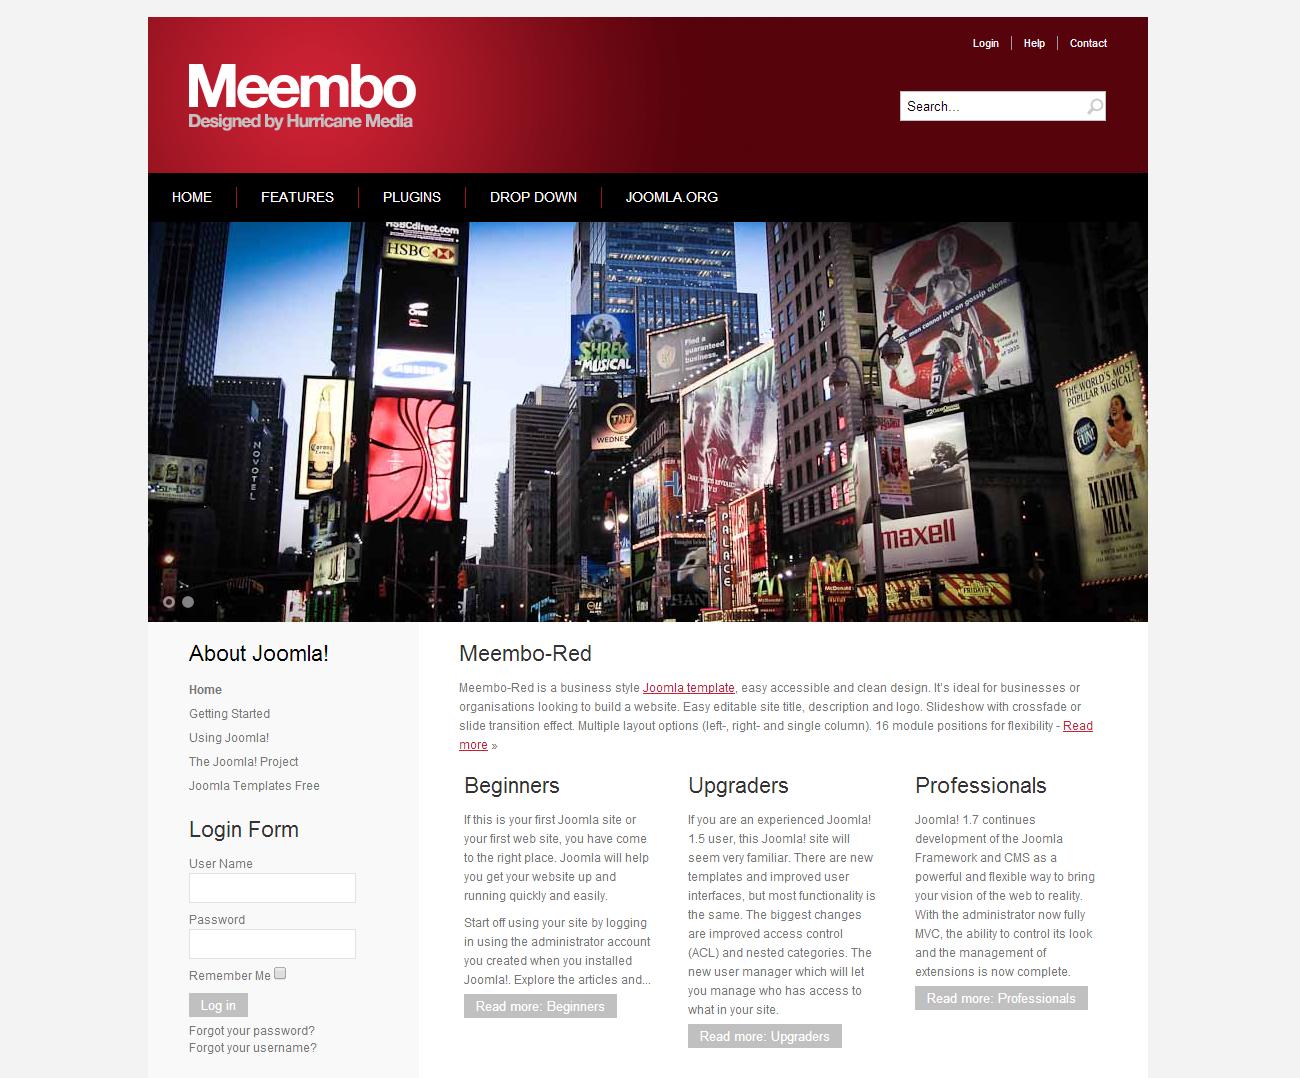 Meembo Free Joomla Template